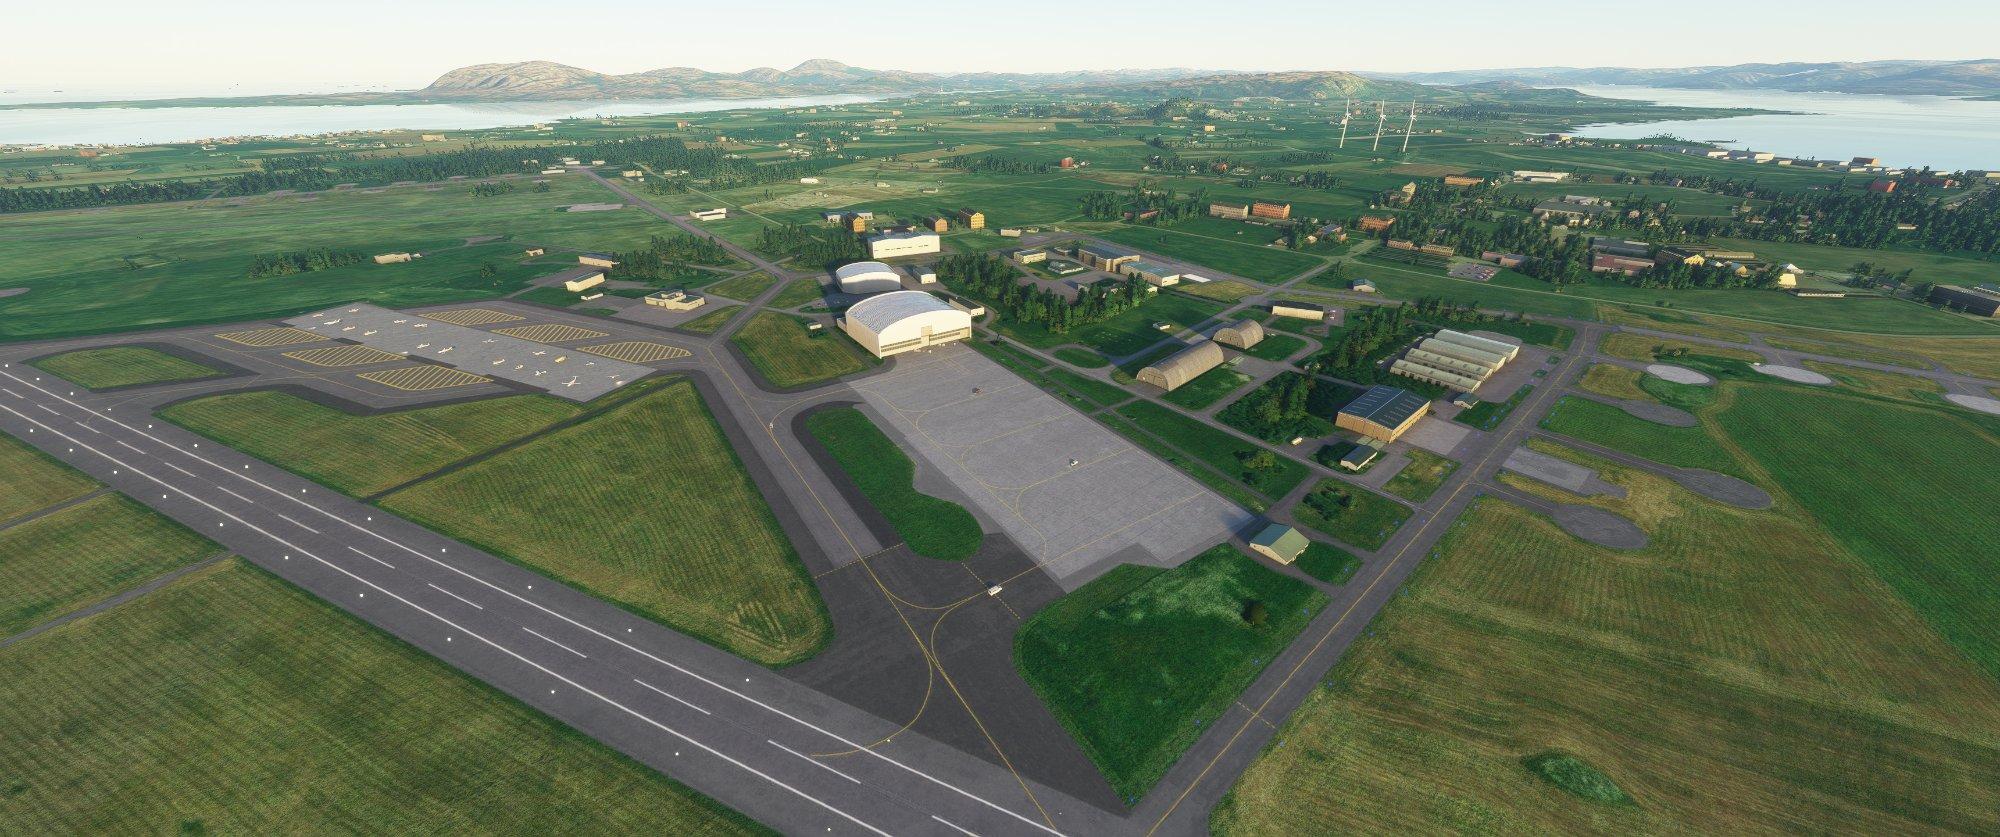 Microsoft Flight Simulator Screenshot 2020.11.09 - 17.40.31.57.jpg